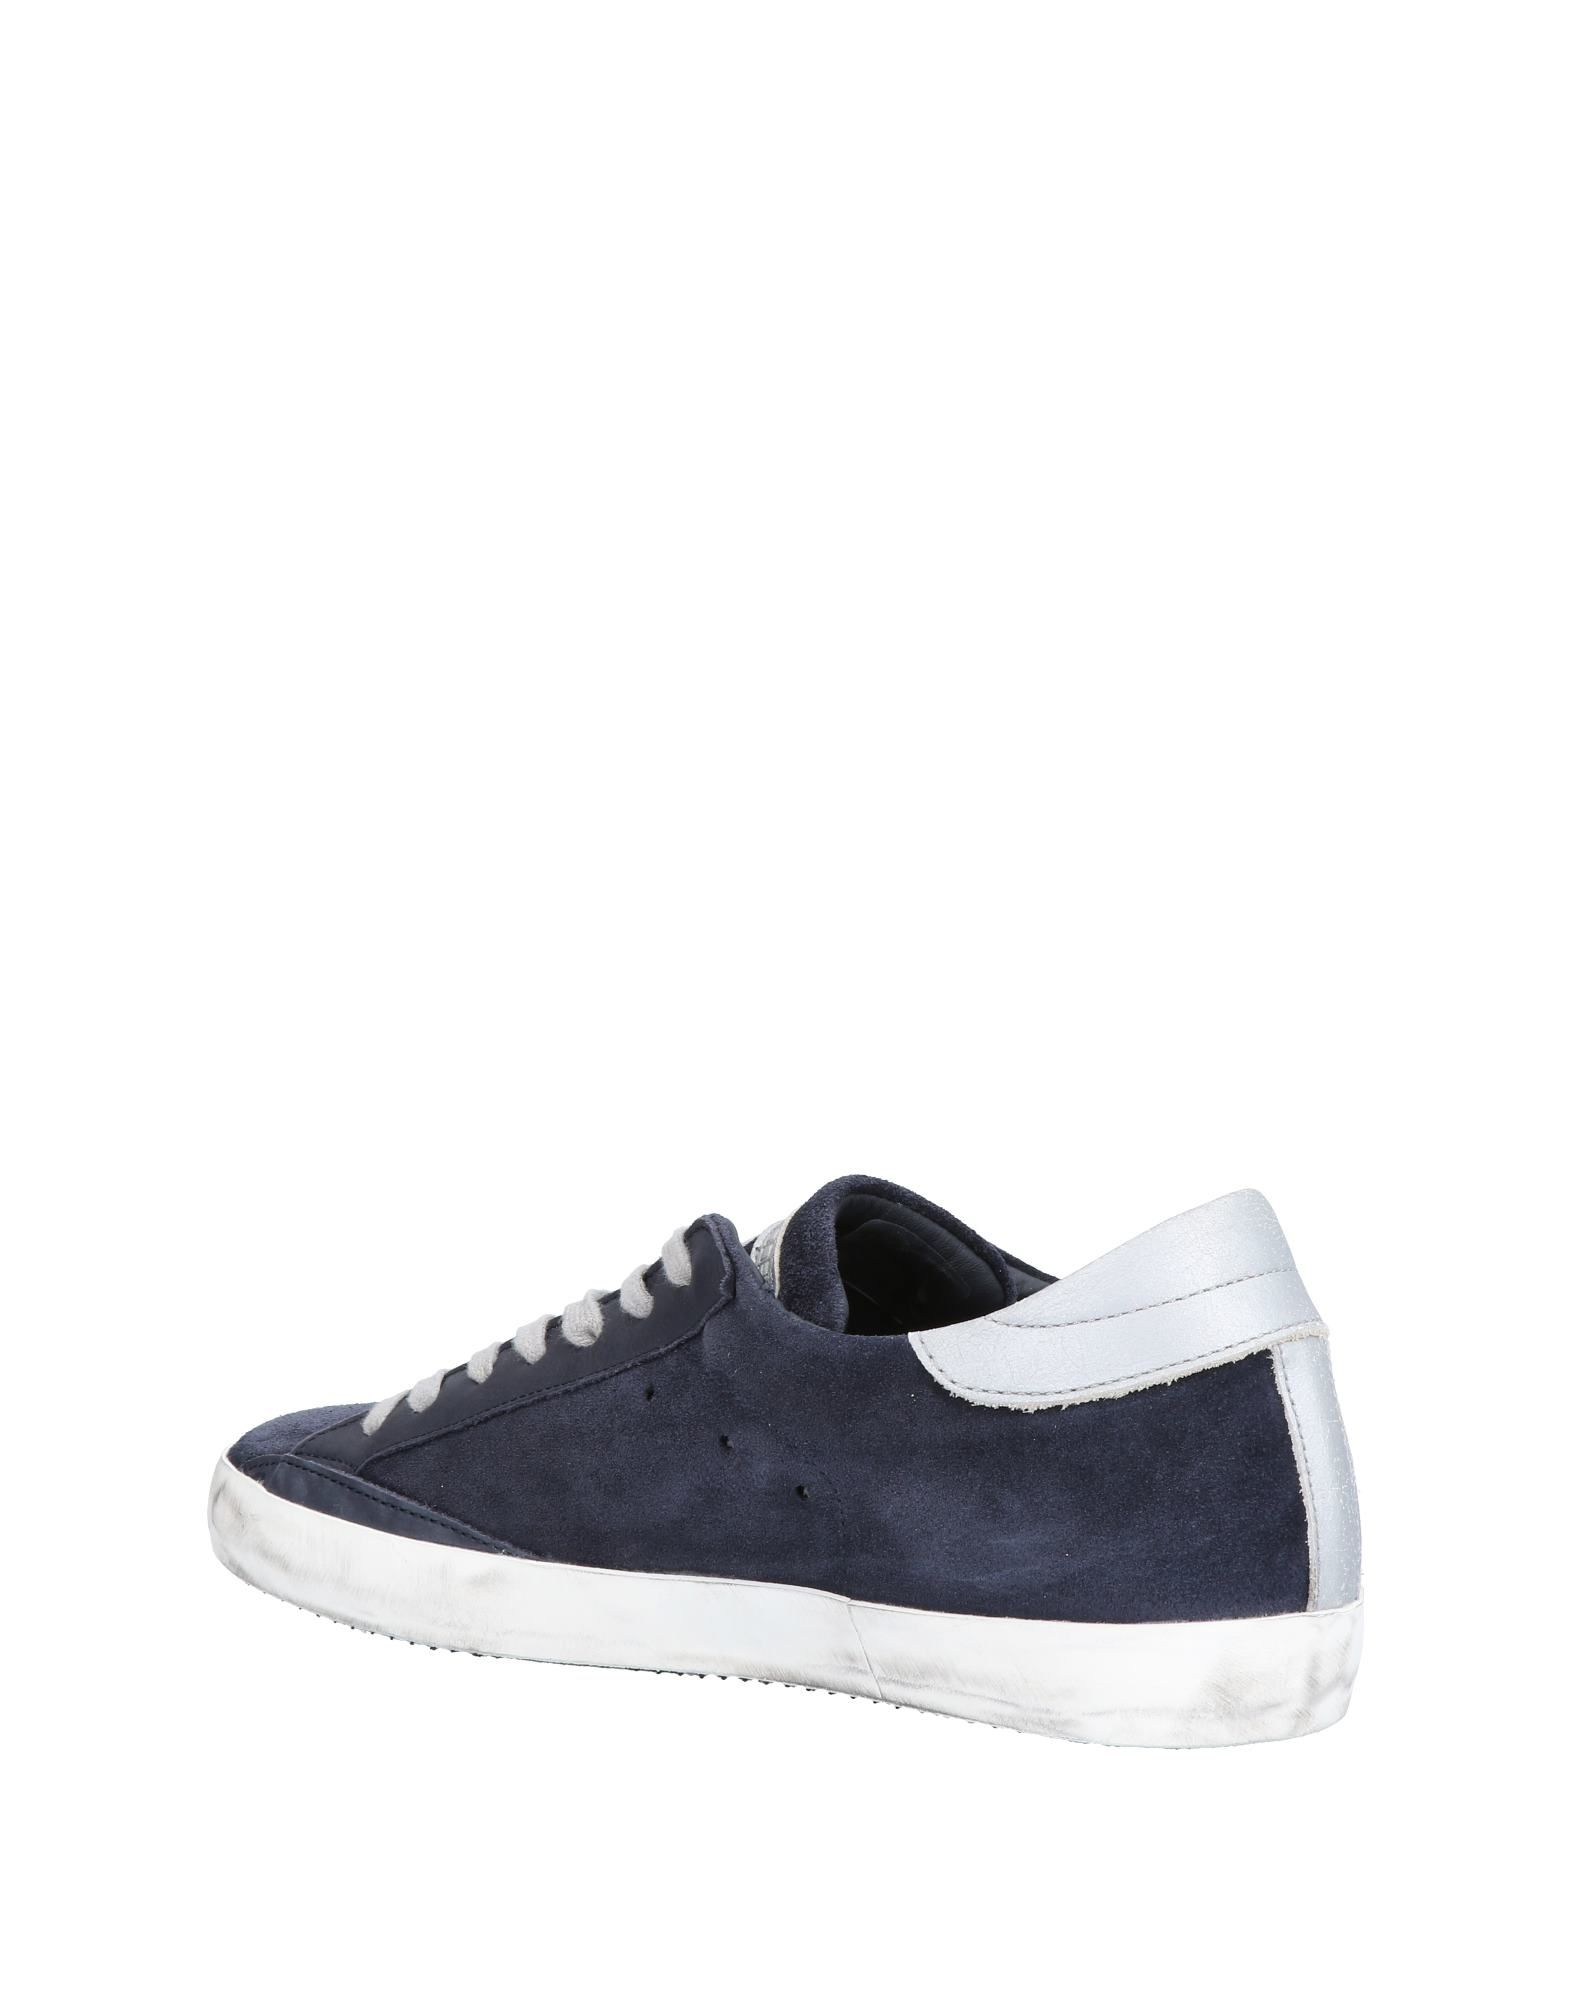 Philippe 11482980KO Model Sneakers Herren  11482980KO Philippe Gute Qualität beliebte Schuhe bd7fe7